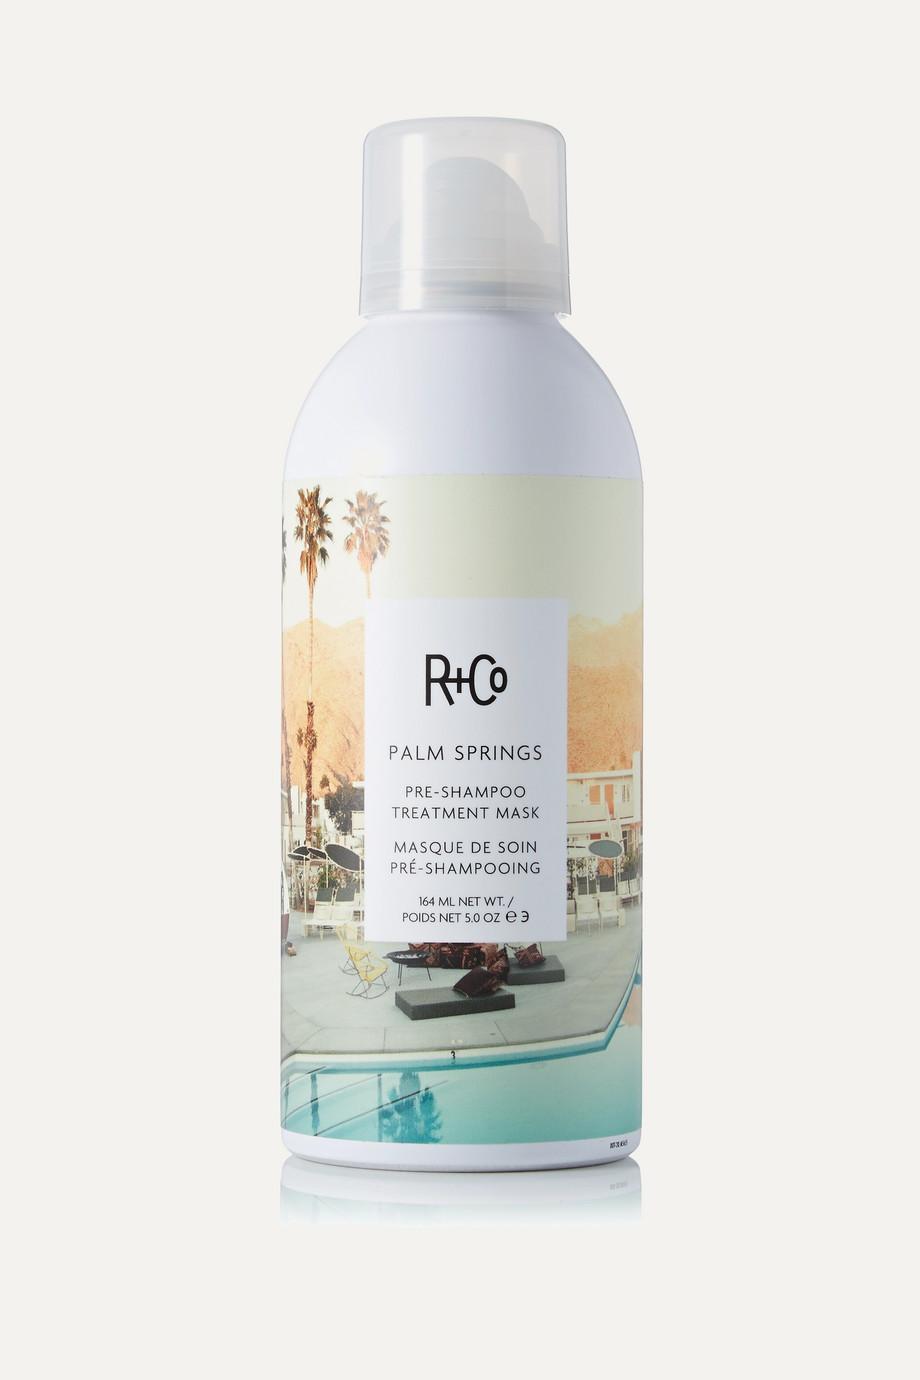 R+Co Palm Springs Pre-Shampoo Treatment Mask, 164ml